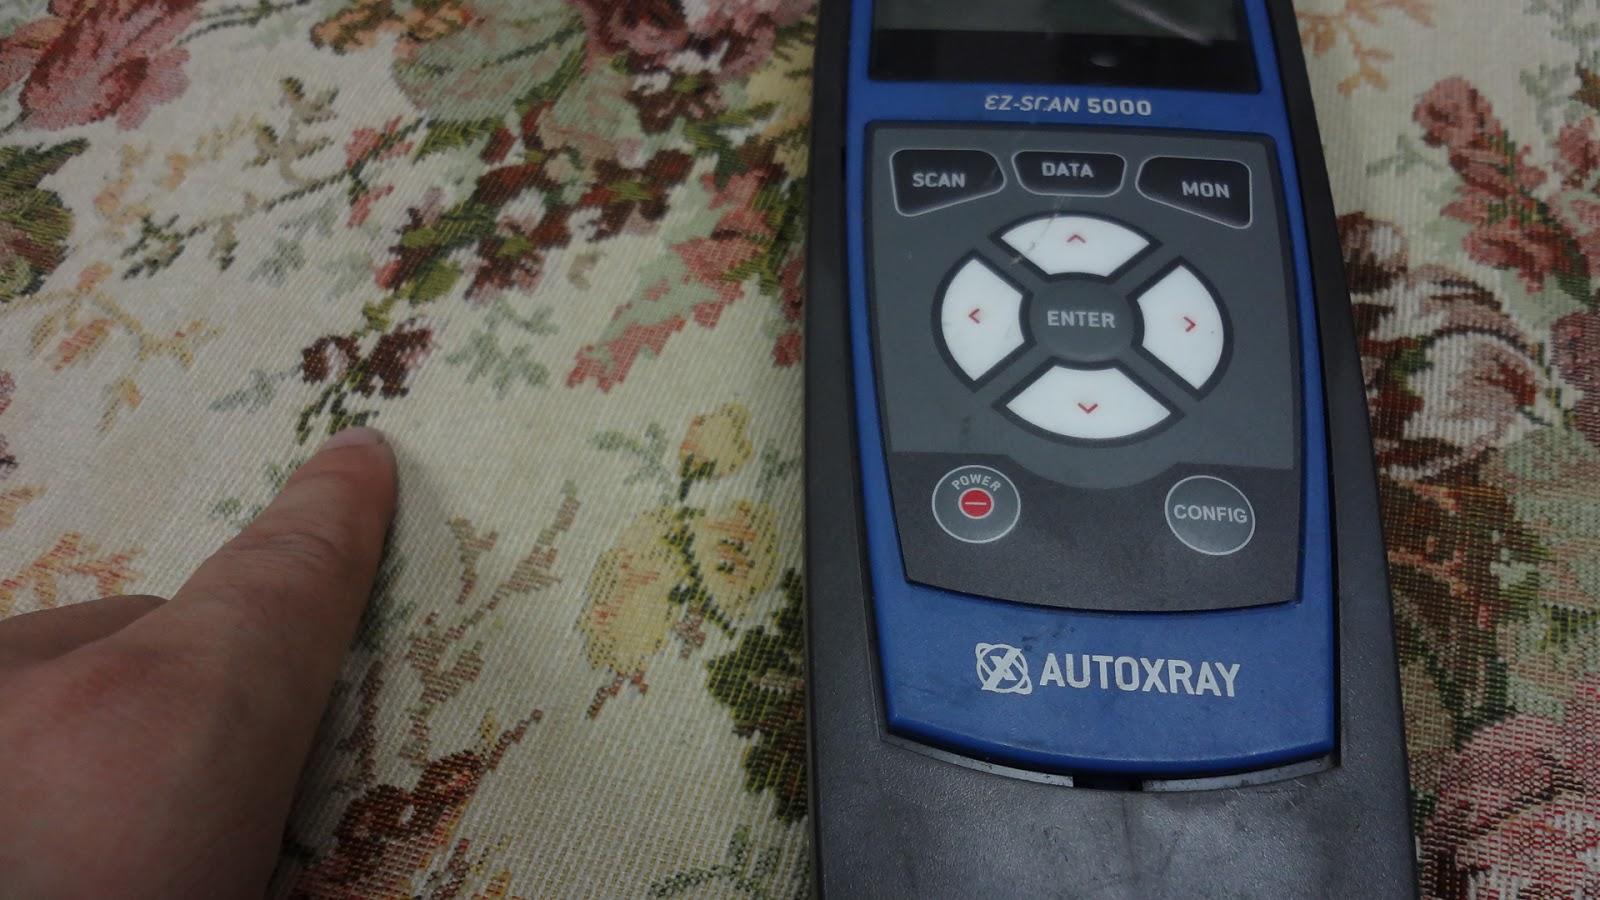 autoxray ez-scan 5000 scanner